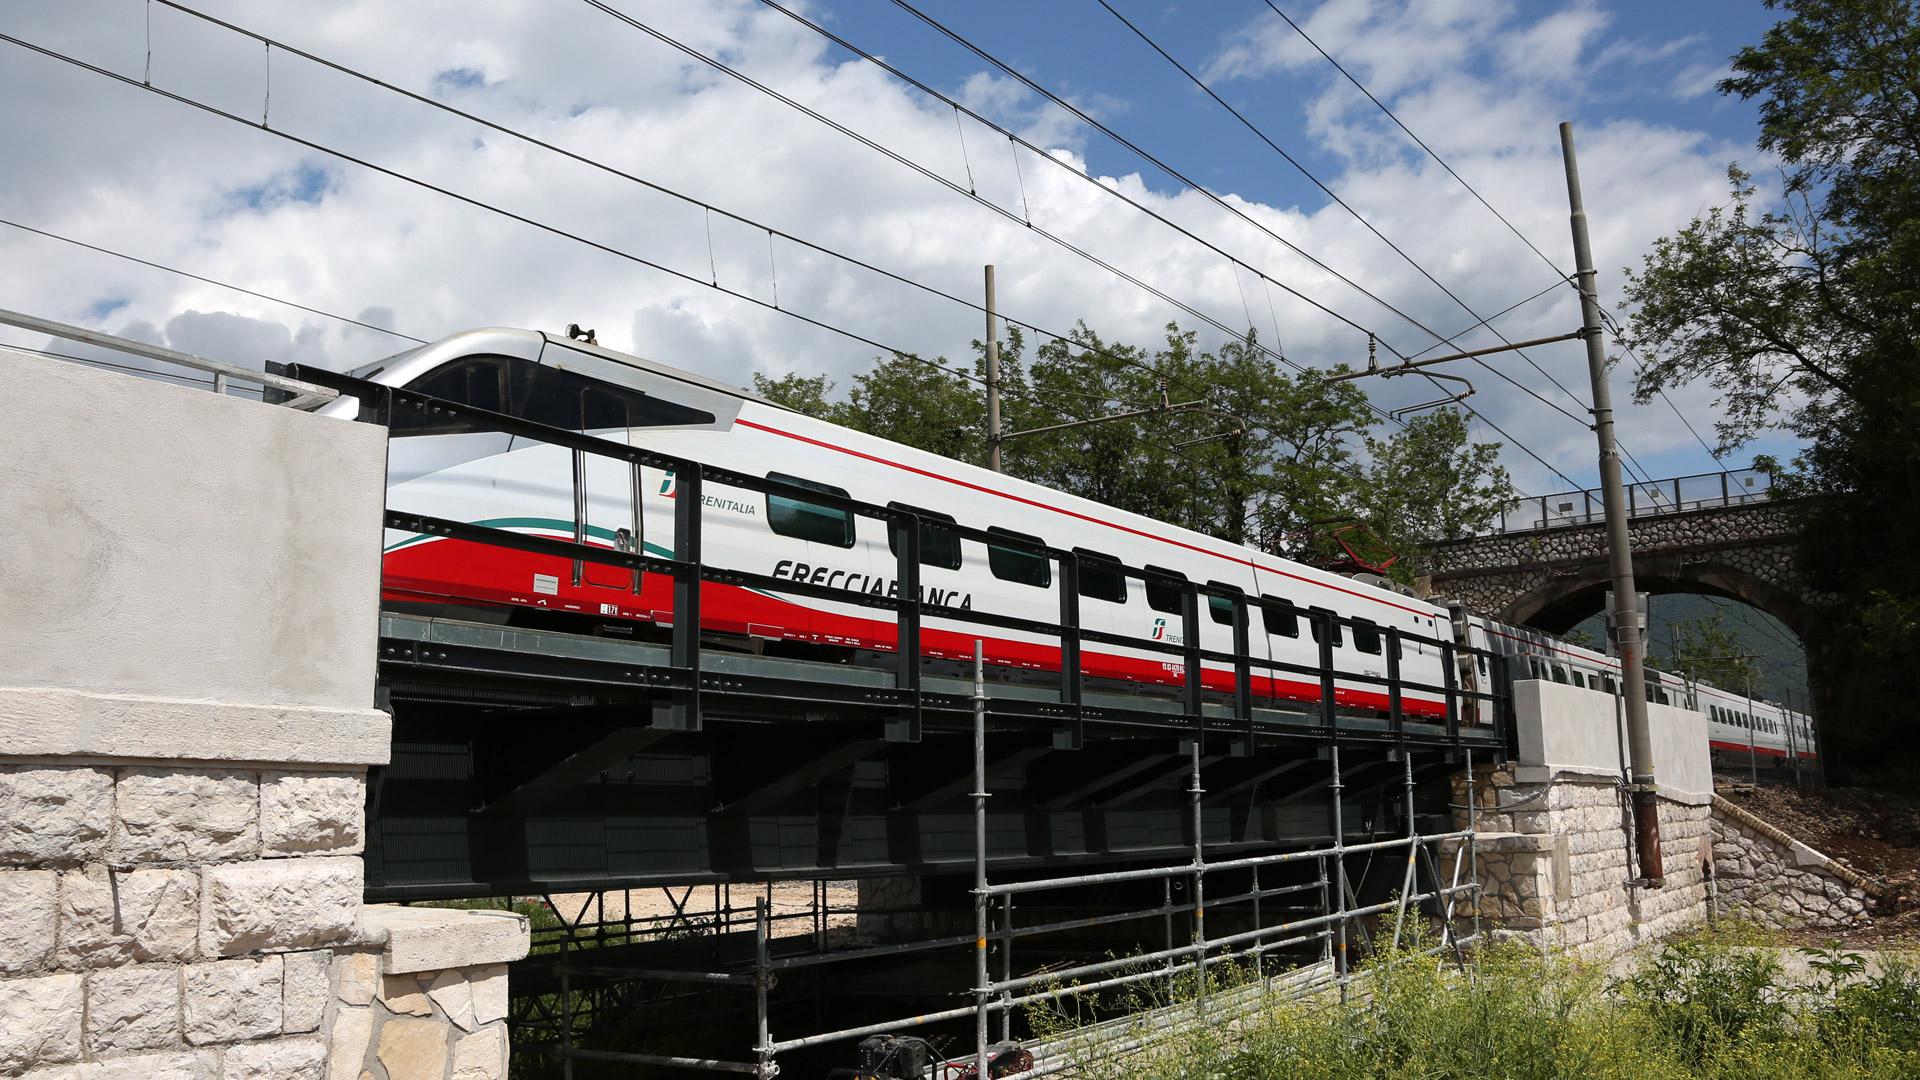 ponte-ferroviario-ninfa-montato-metal-engineering-carpenteria-metallica-civile